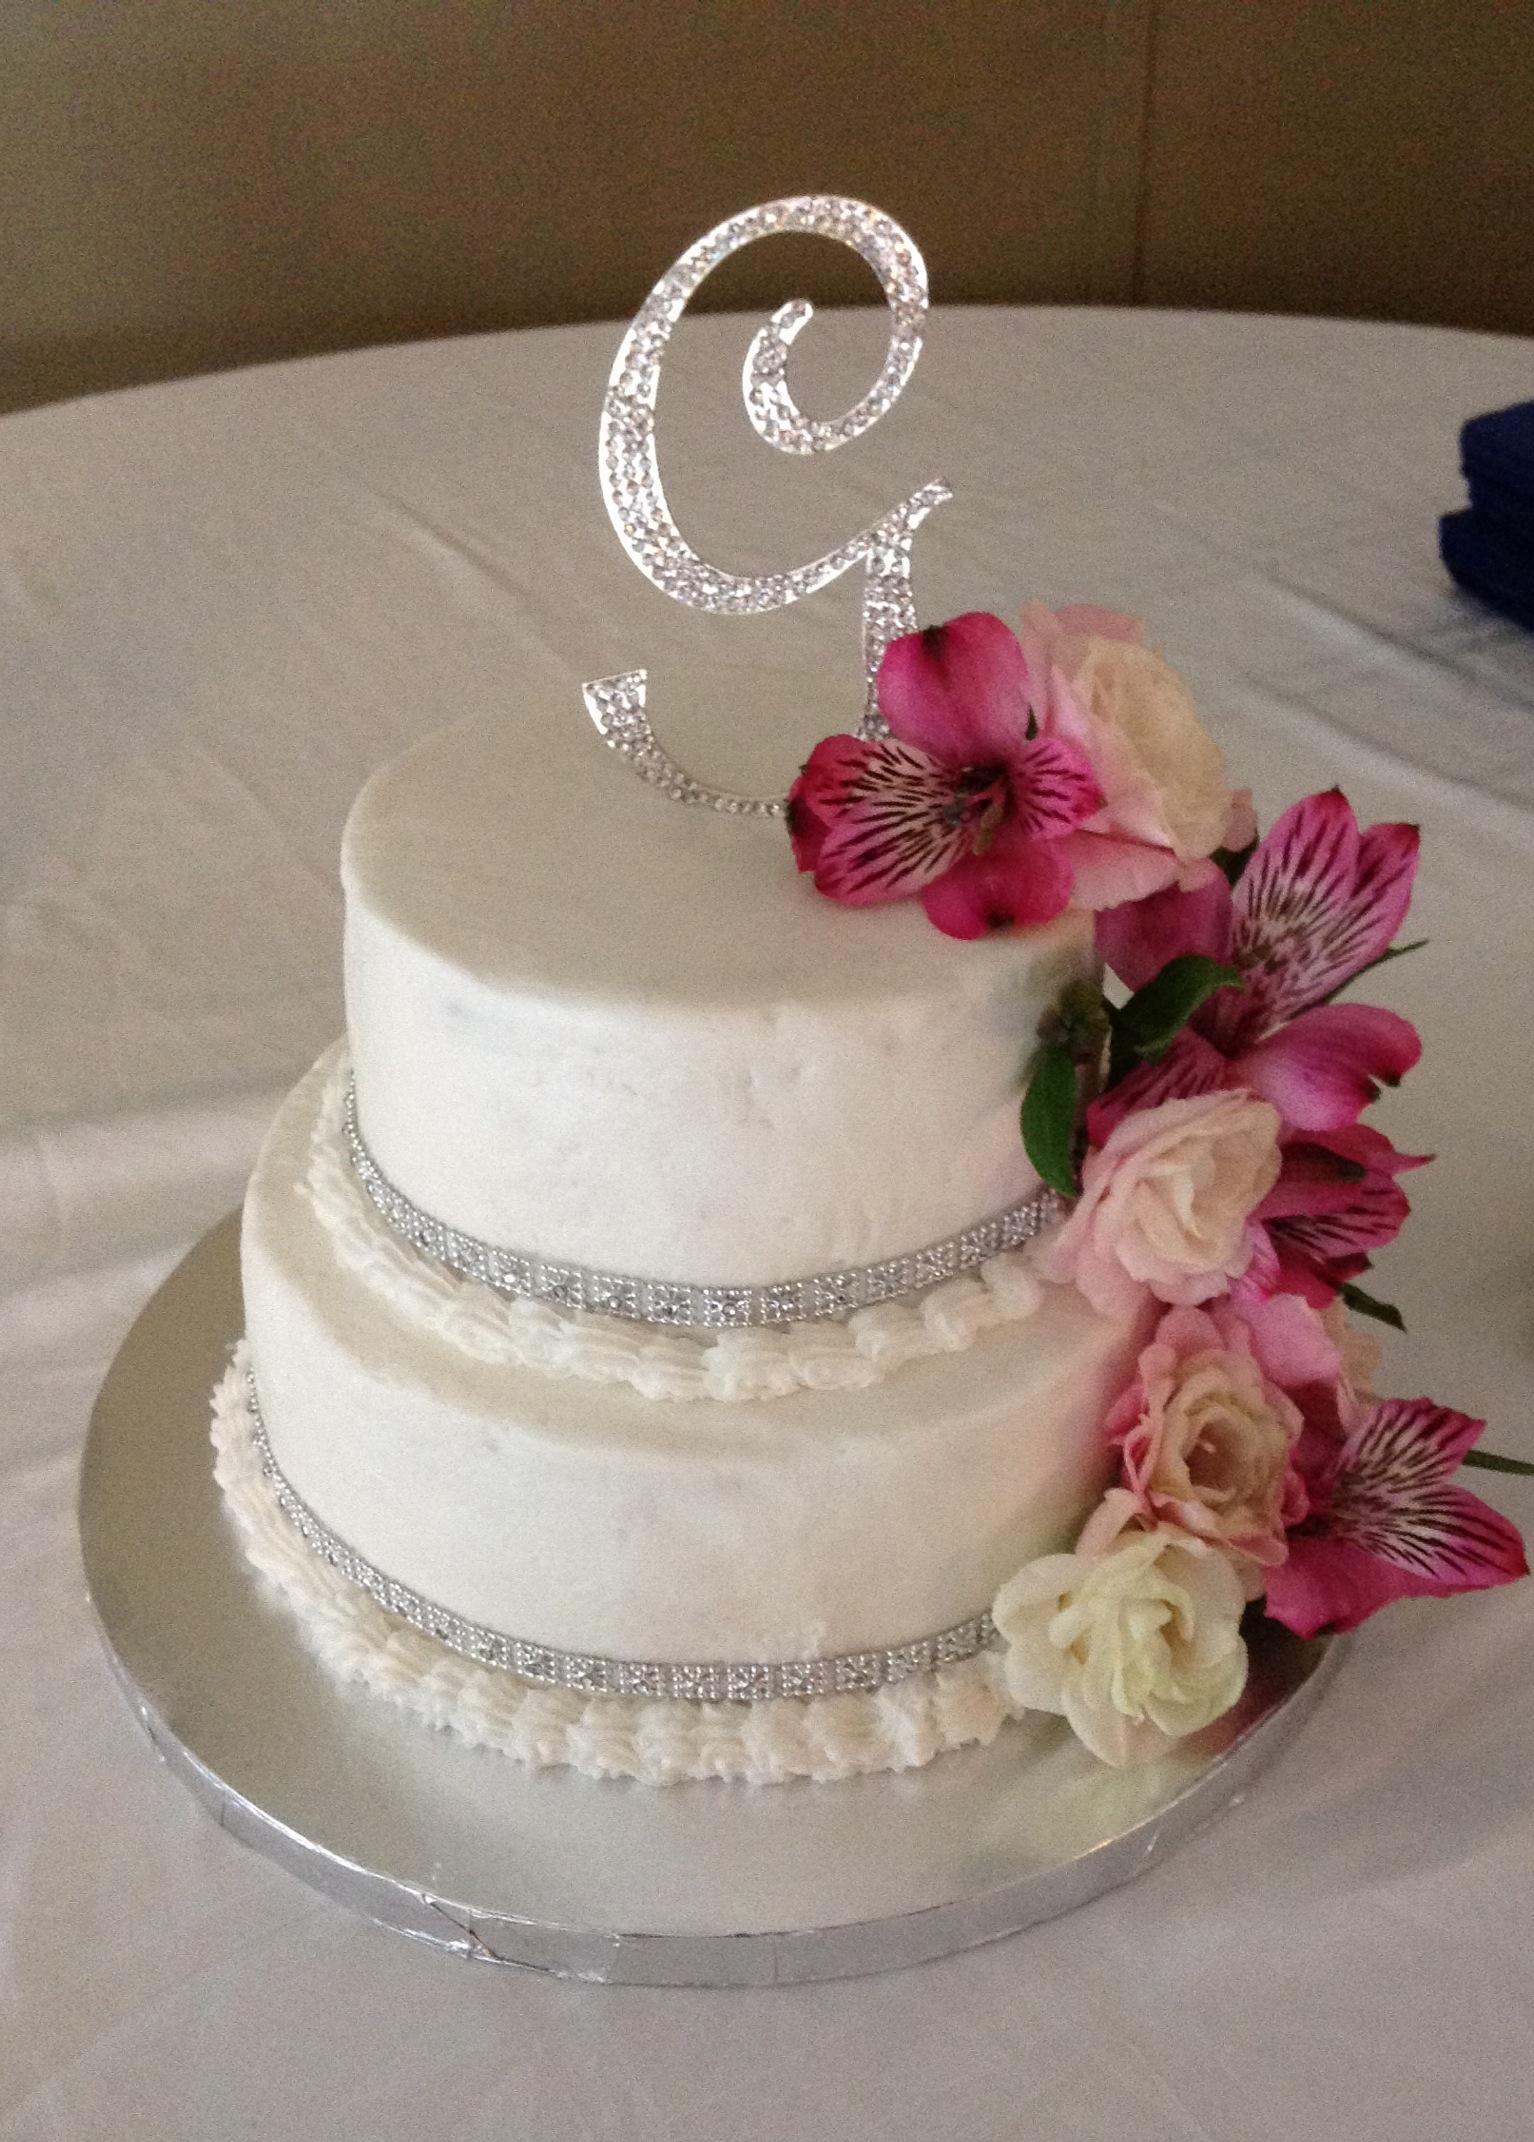 Bling Design Wedding Cake